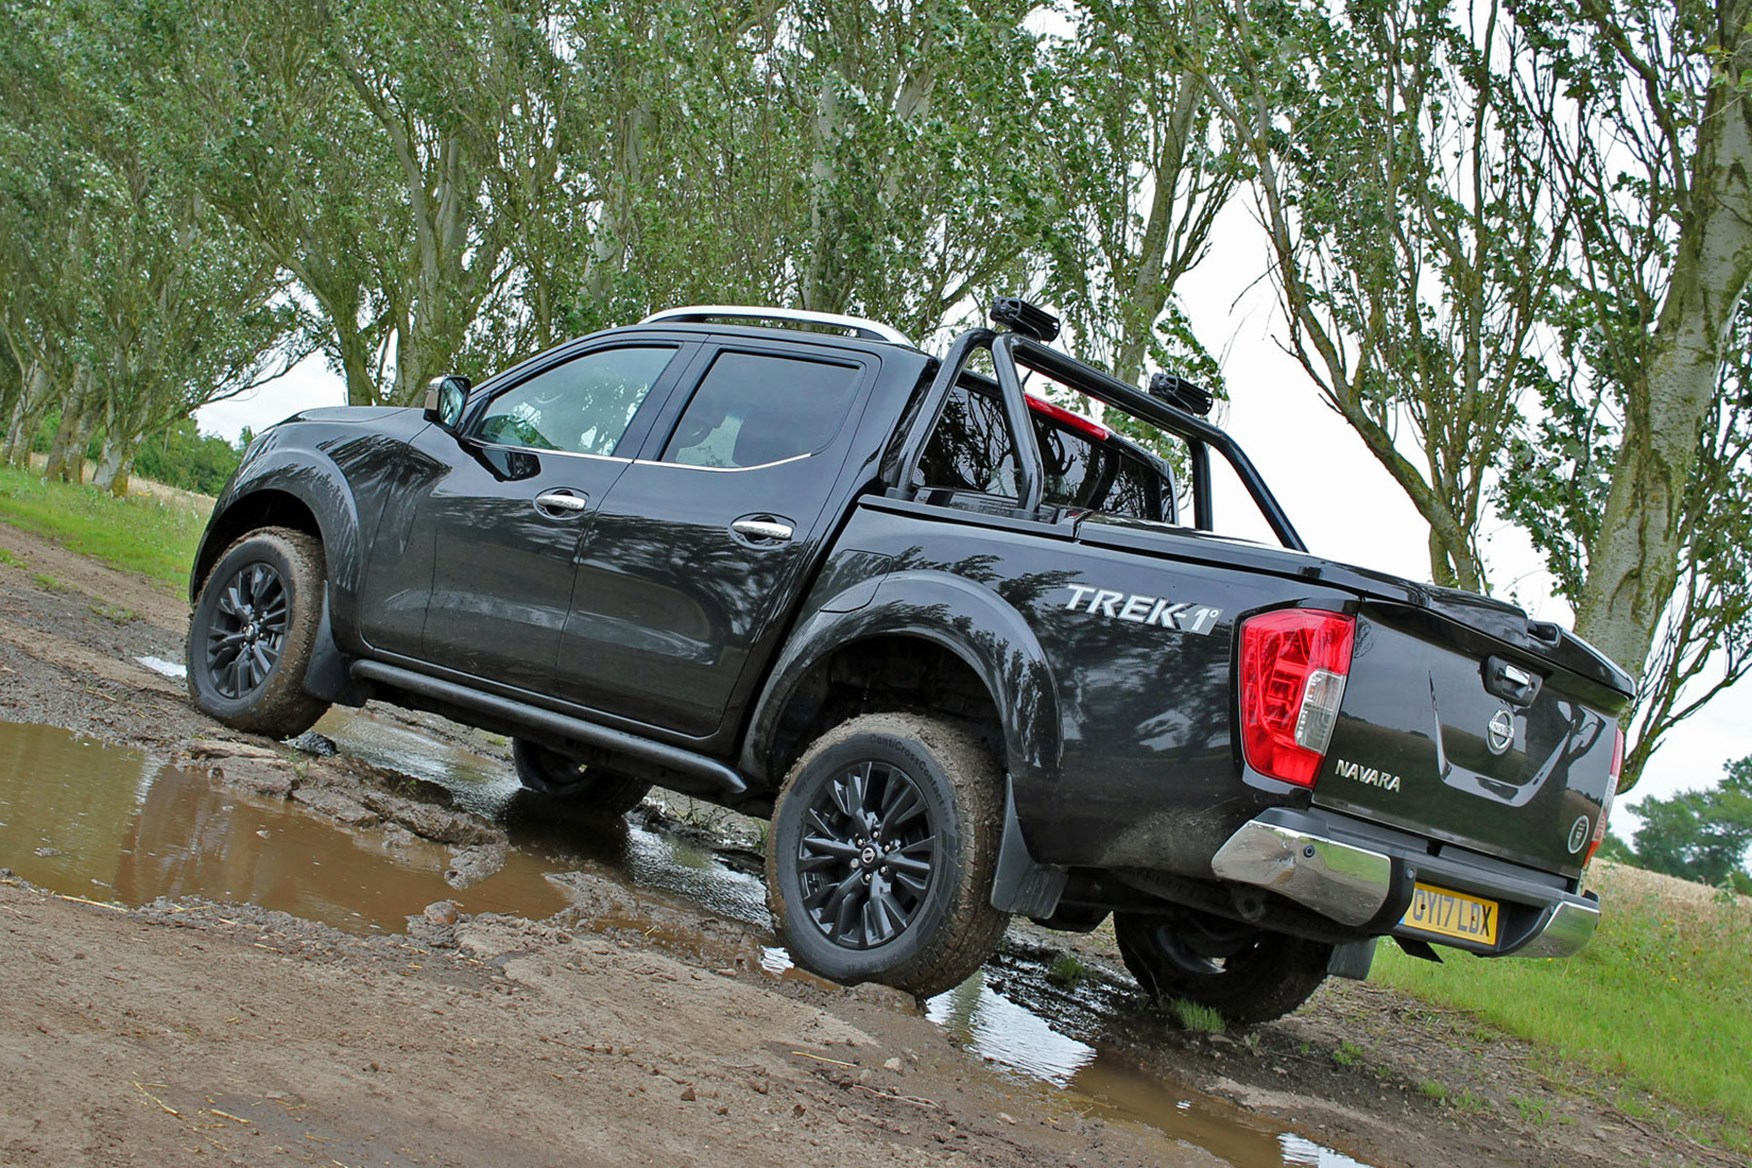 Nissan Navara Trek-1 review - rear view, black, parked in muddy puddle